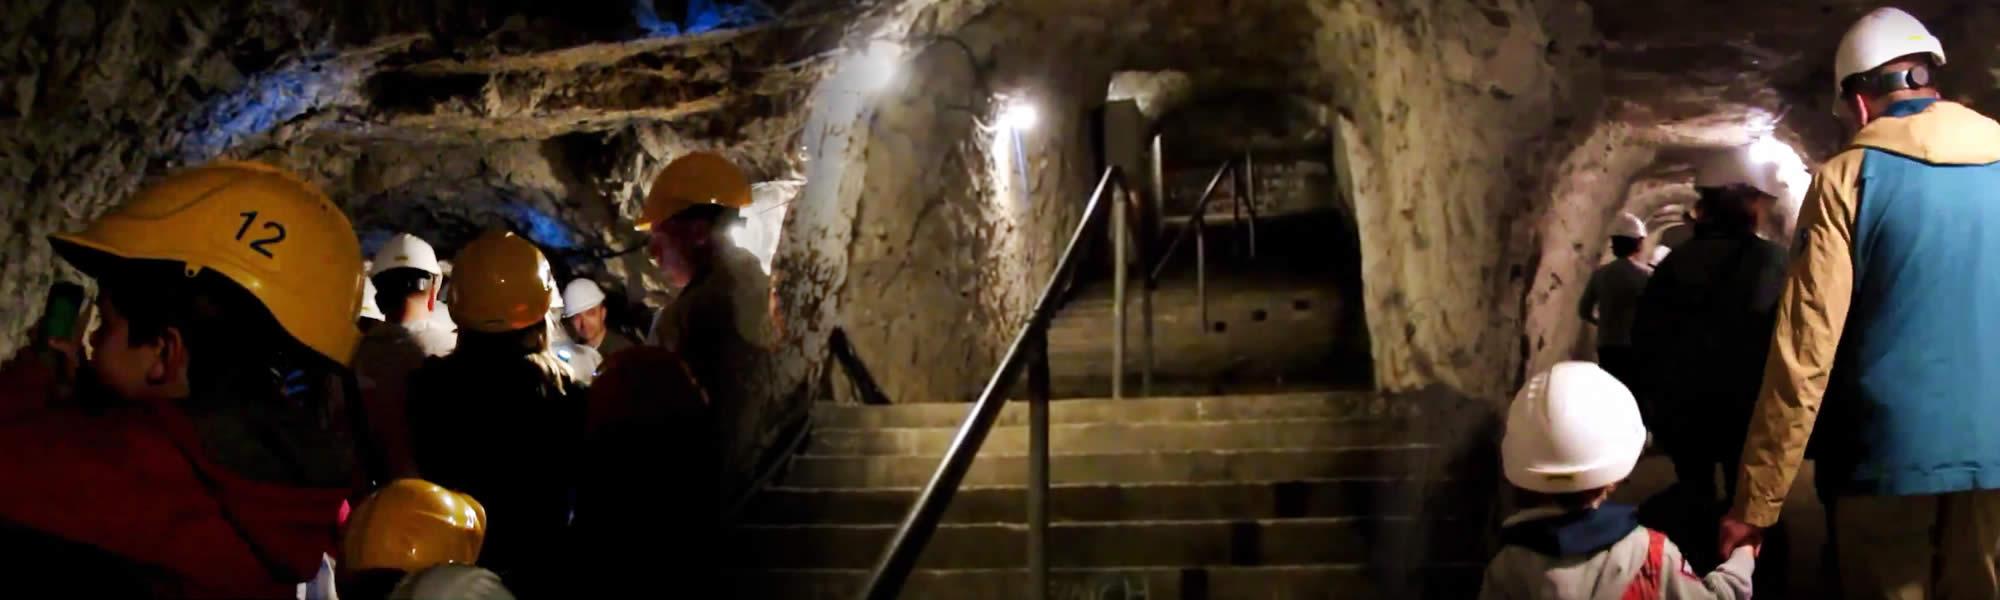 Ramsgate Tunnels - Visit Ramsgate